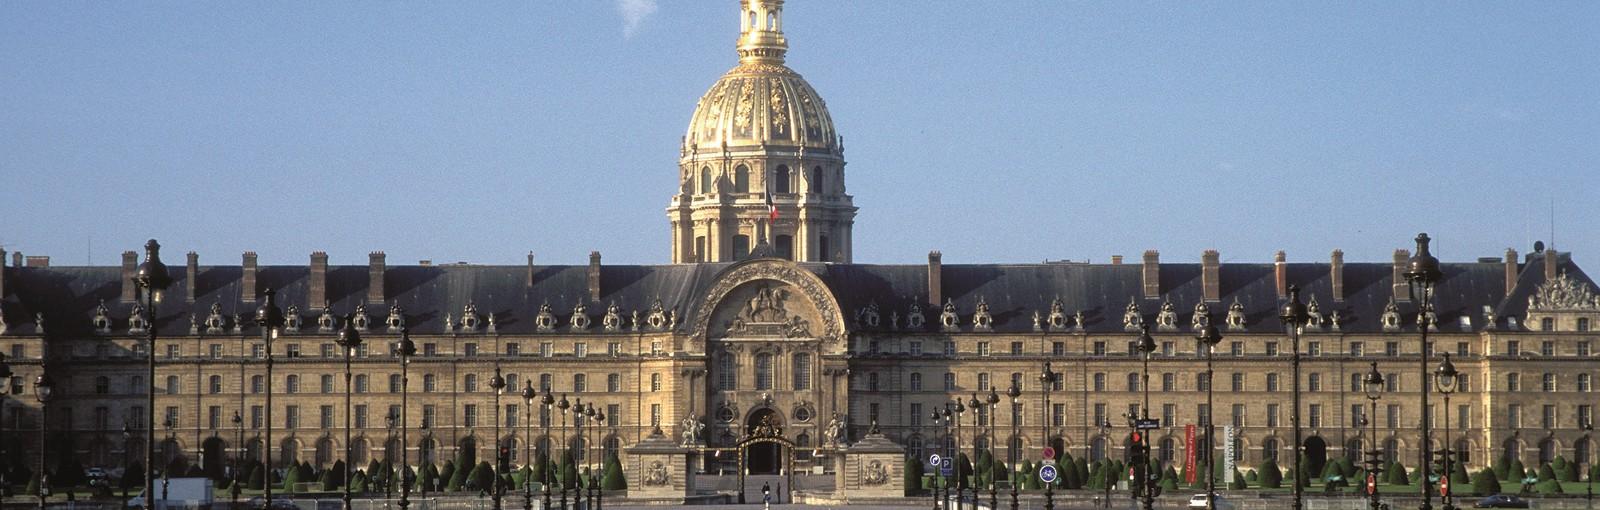 Tours The Invalides, the Army Museum, the Tomb of Napoleon - Walking tours - Paris Tours